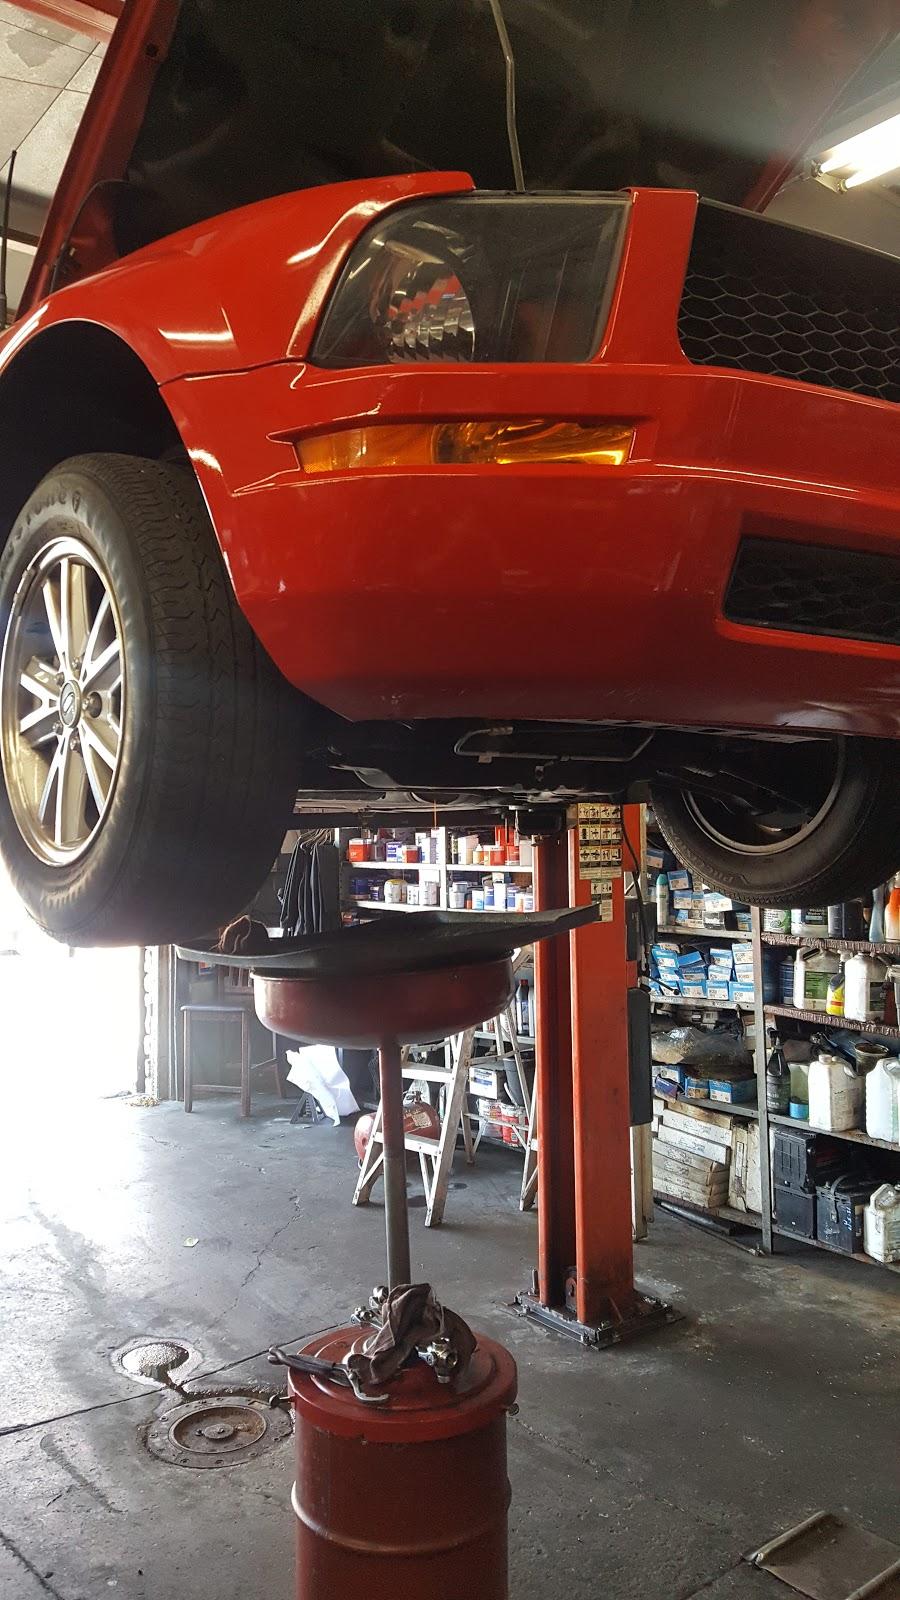 Full Service Auto - car repair  | Photo 1 of 1 | Address: 1007 N La Brea Ave, Inglewood, CA 90302, USA | Phone: (310) 673-0424